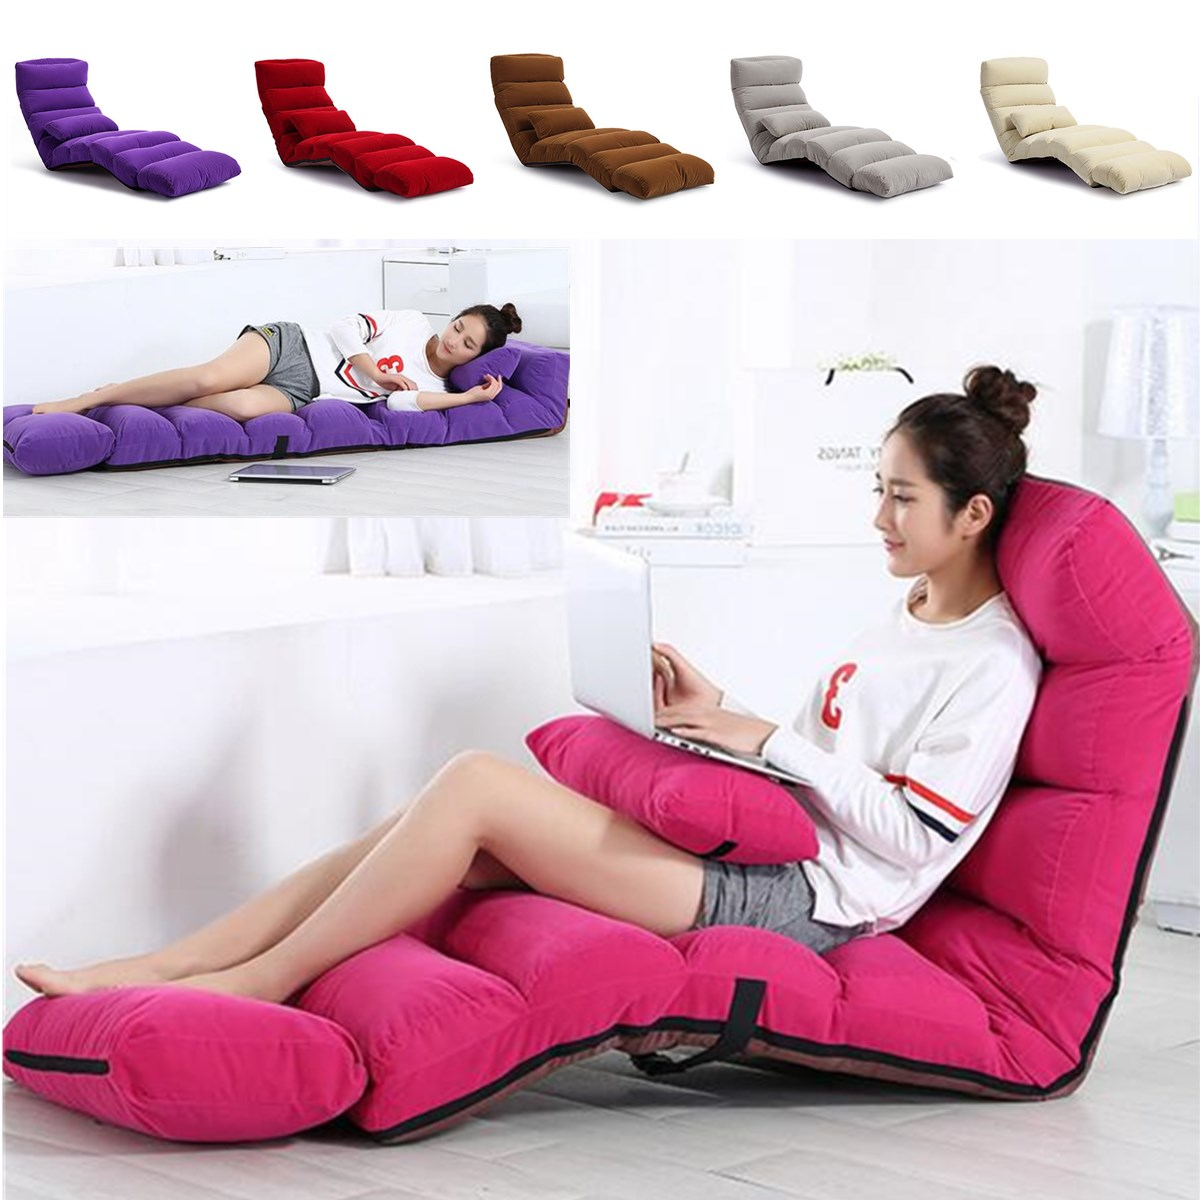 Fine 205Cm 3 Folding Lazy Sofa Chair Couch Bed Lounge With Pillow Inzonedesignstudio Interior Chair Design Inzonedesignstudiocom